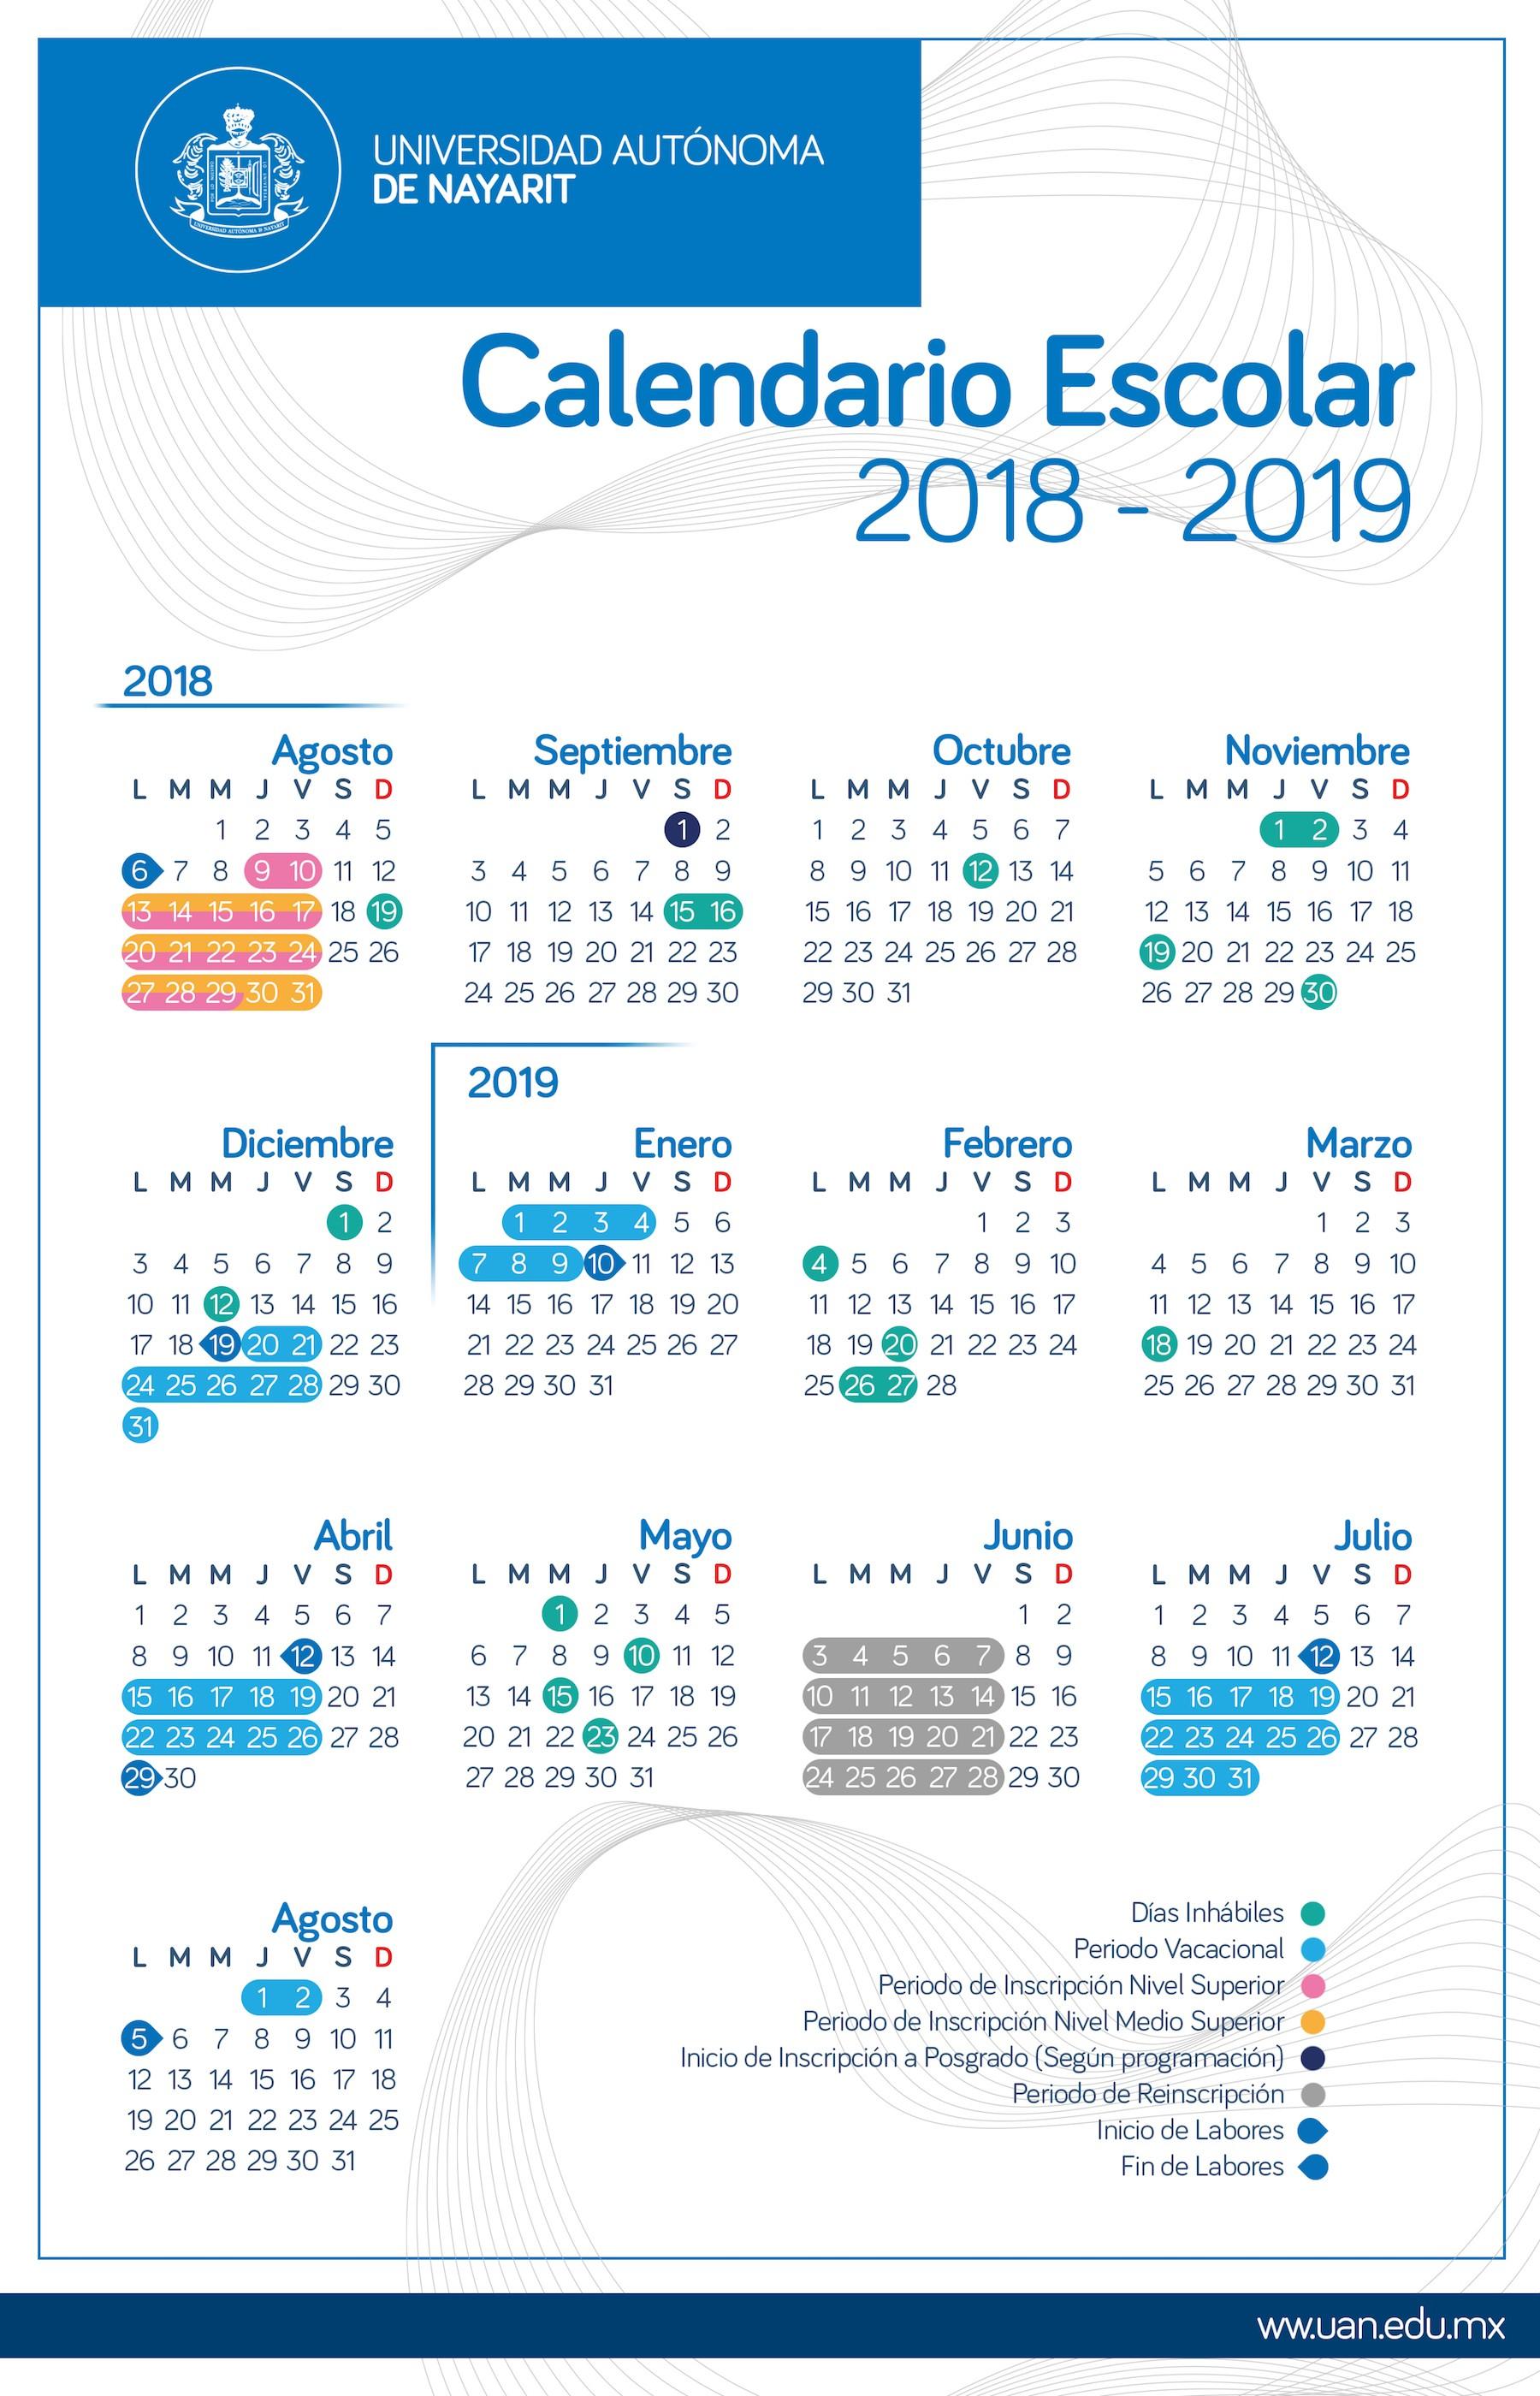 Calendario 2019 Para Imprimir Com Feriados Sp Más Caliente Calendario De eventos De La Uan Of Calendario 2019 Para Imprimir Com Feriados Sp Mejores Y Más Novedosos Calendario